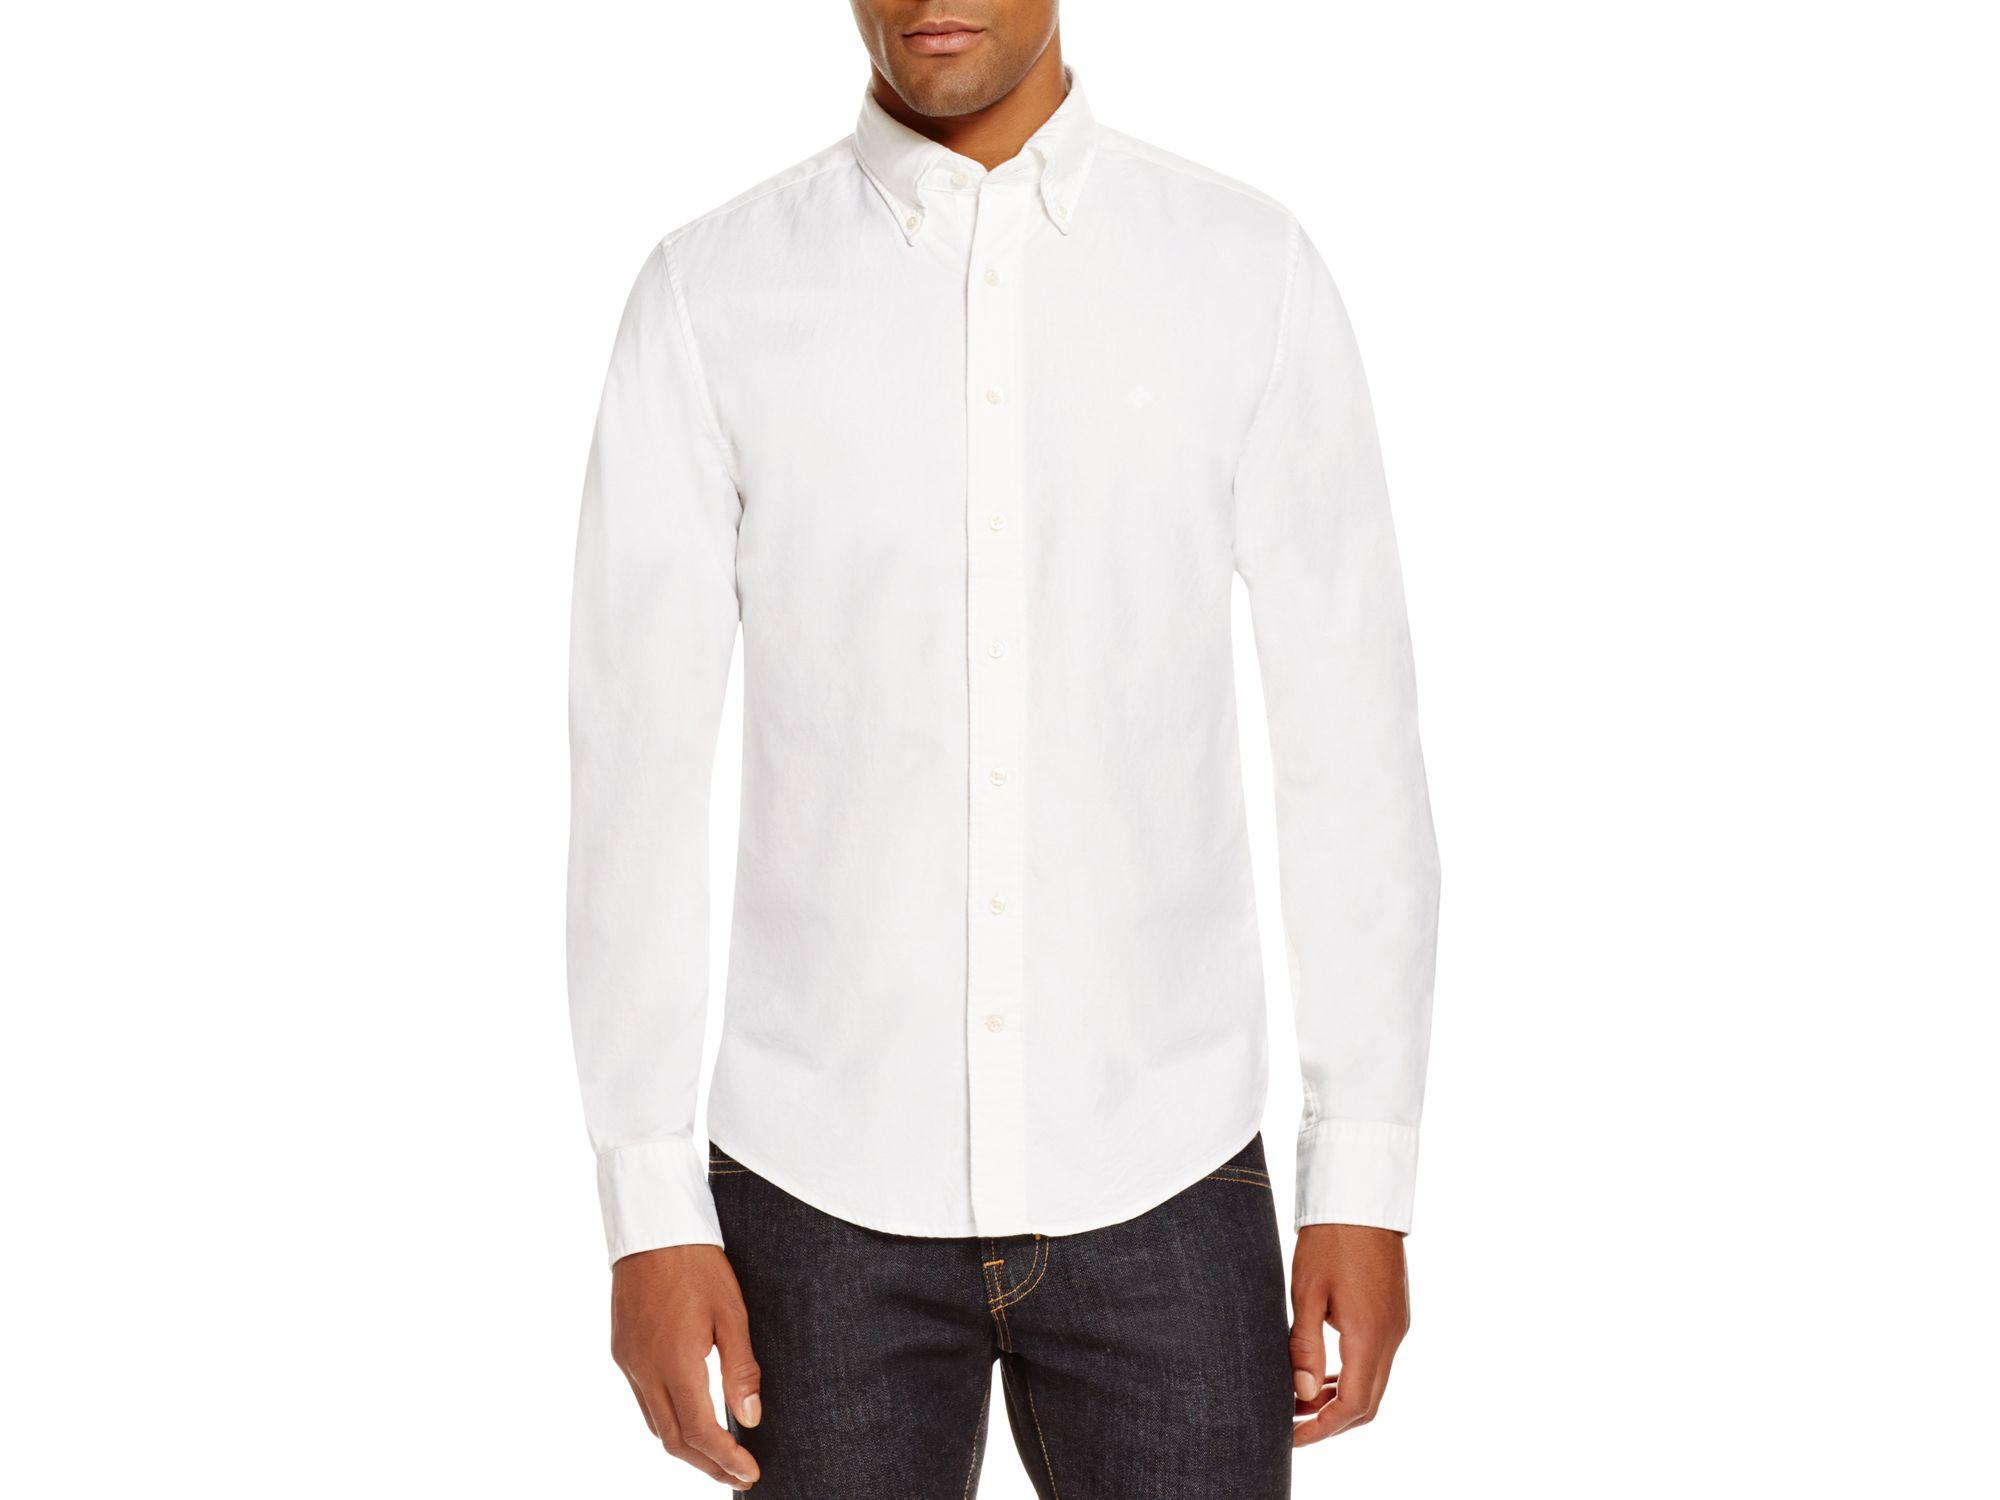 Gant perfect oxford slim fit button down shirt in white for Slim fit white button down shirt